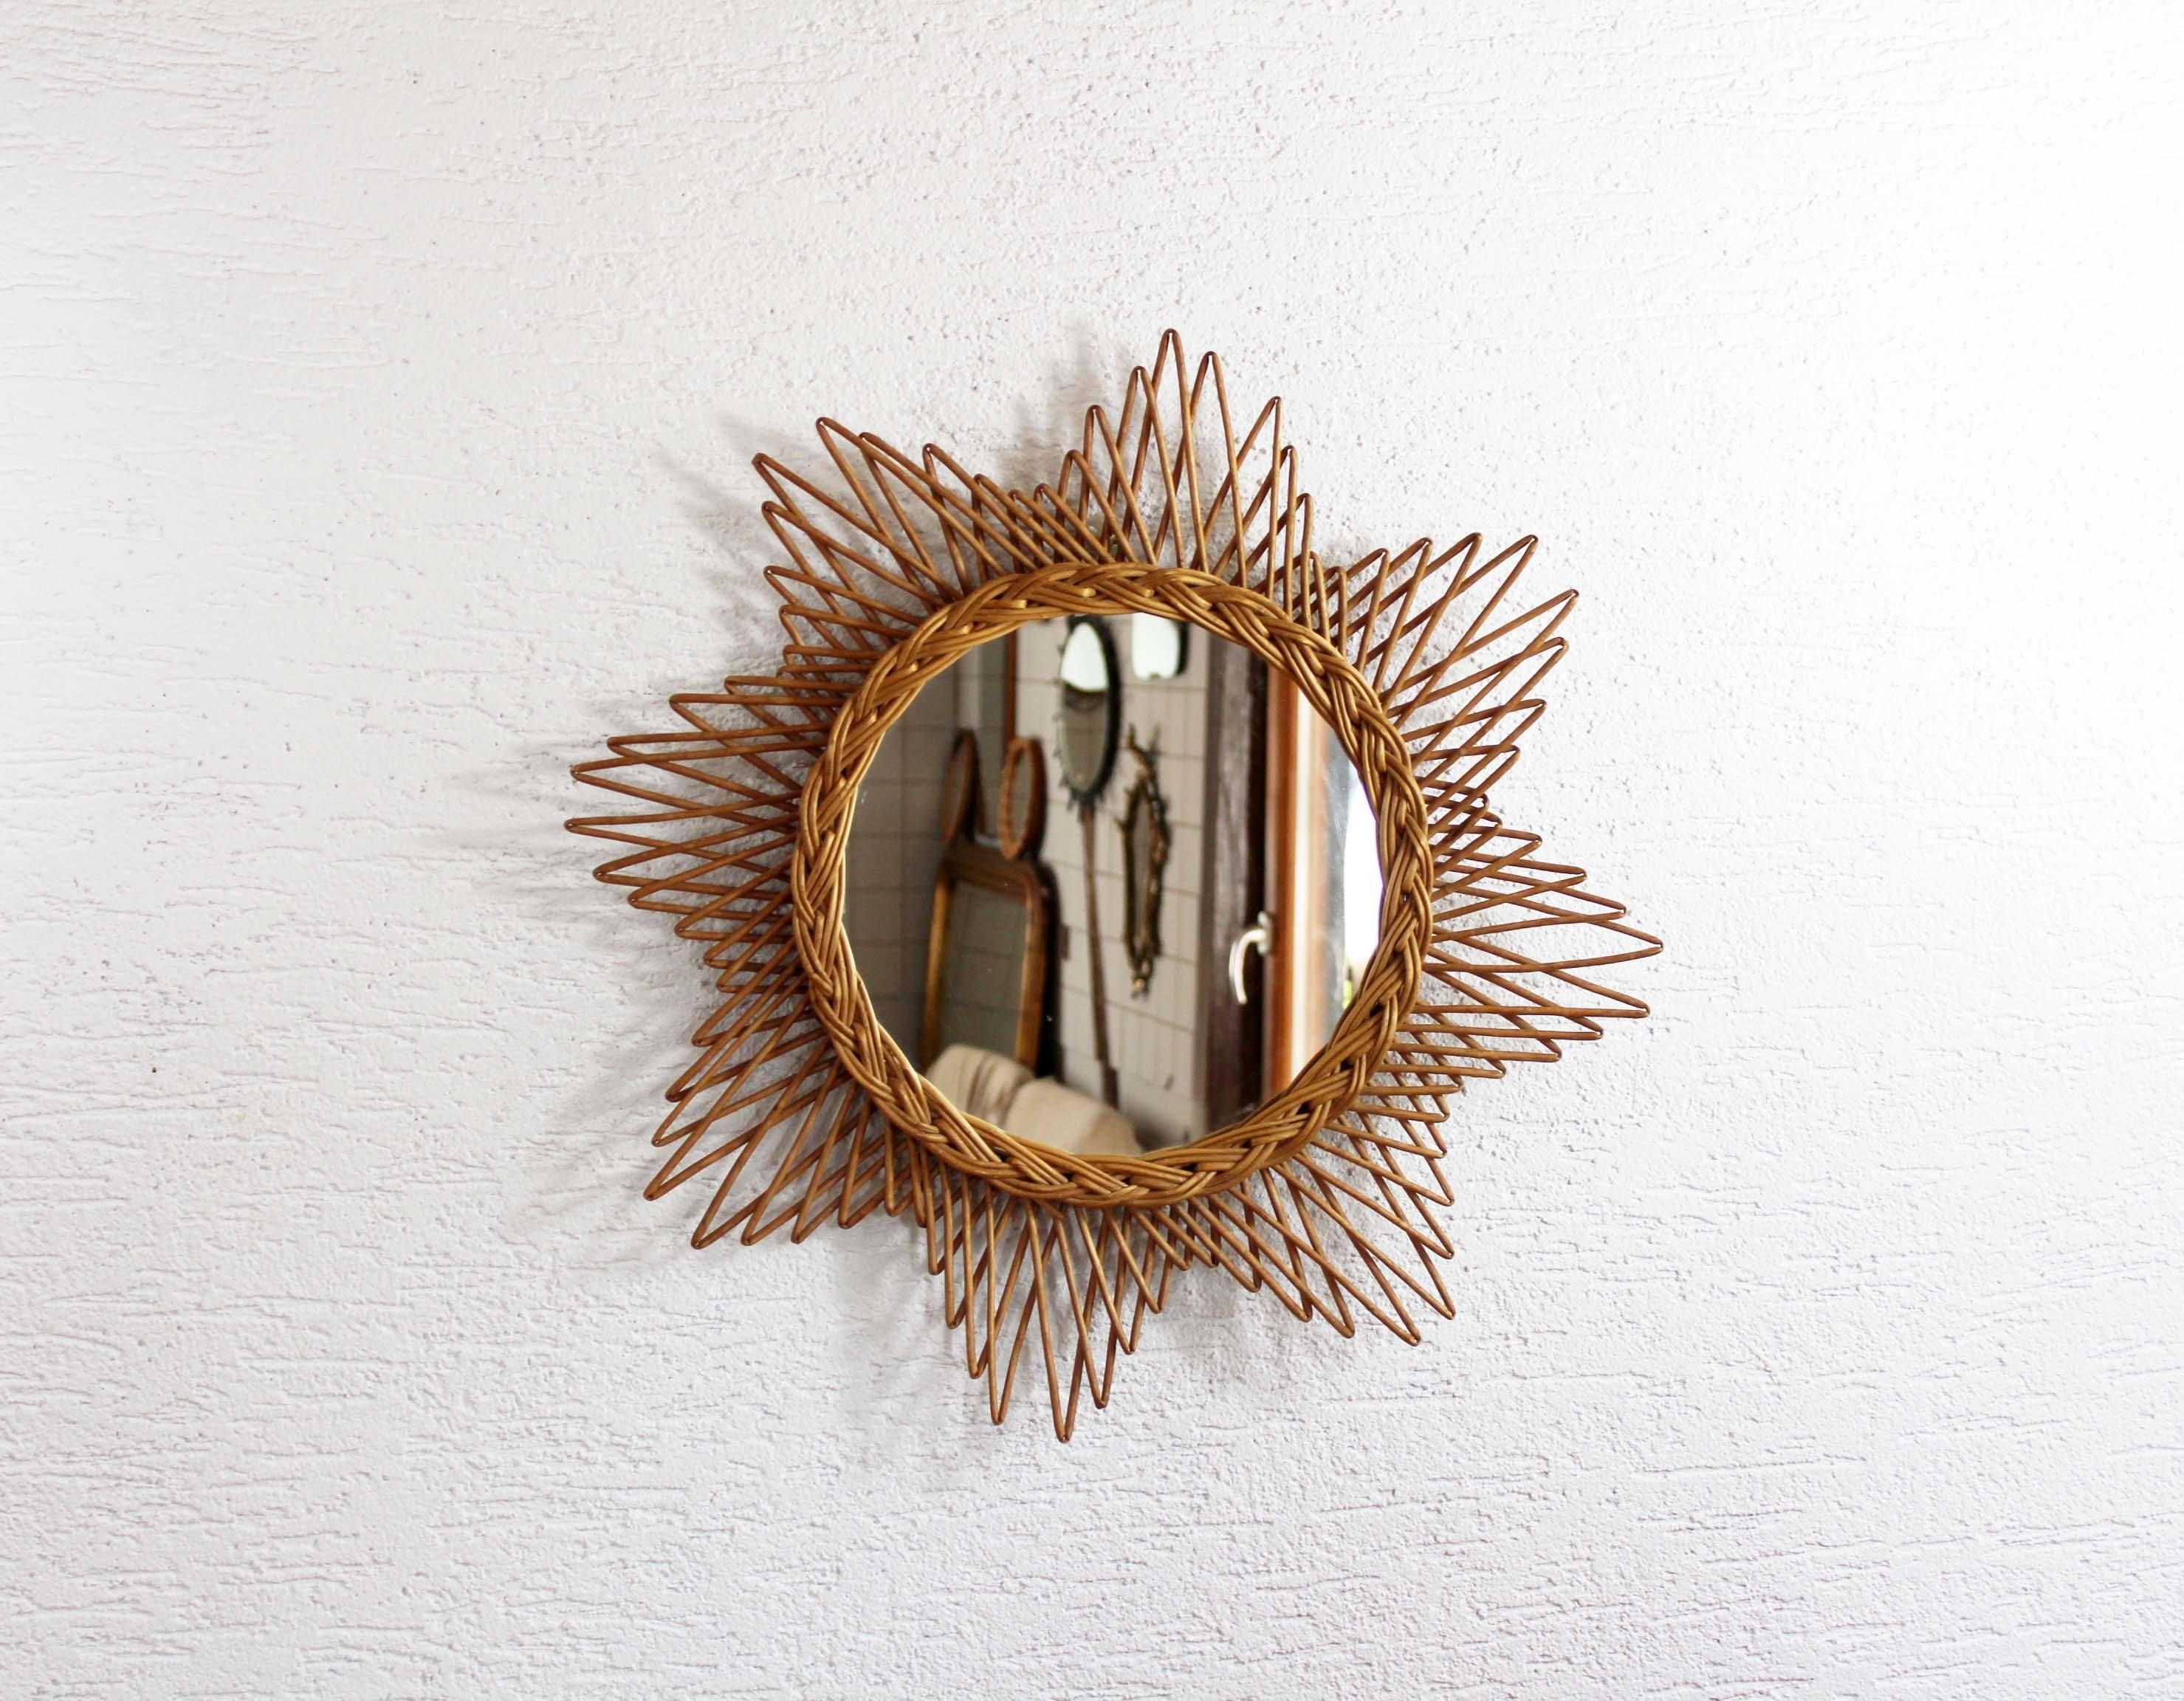 miroir soleil ou toile en osier syn brocante. Black Bedroom Furniture Sets. Home Design Ideas